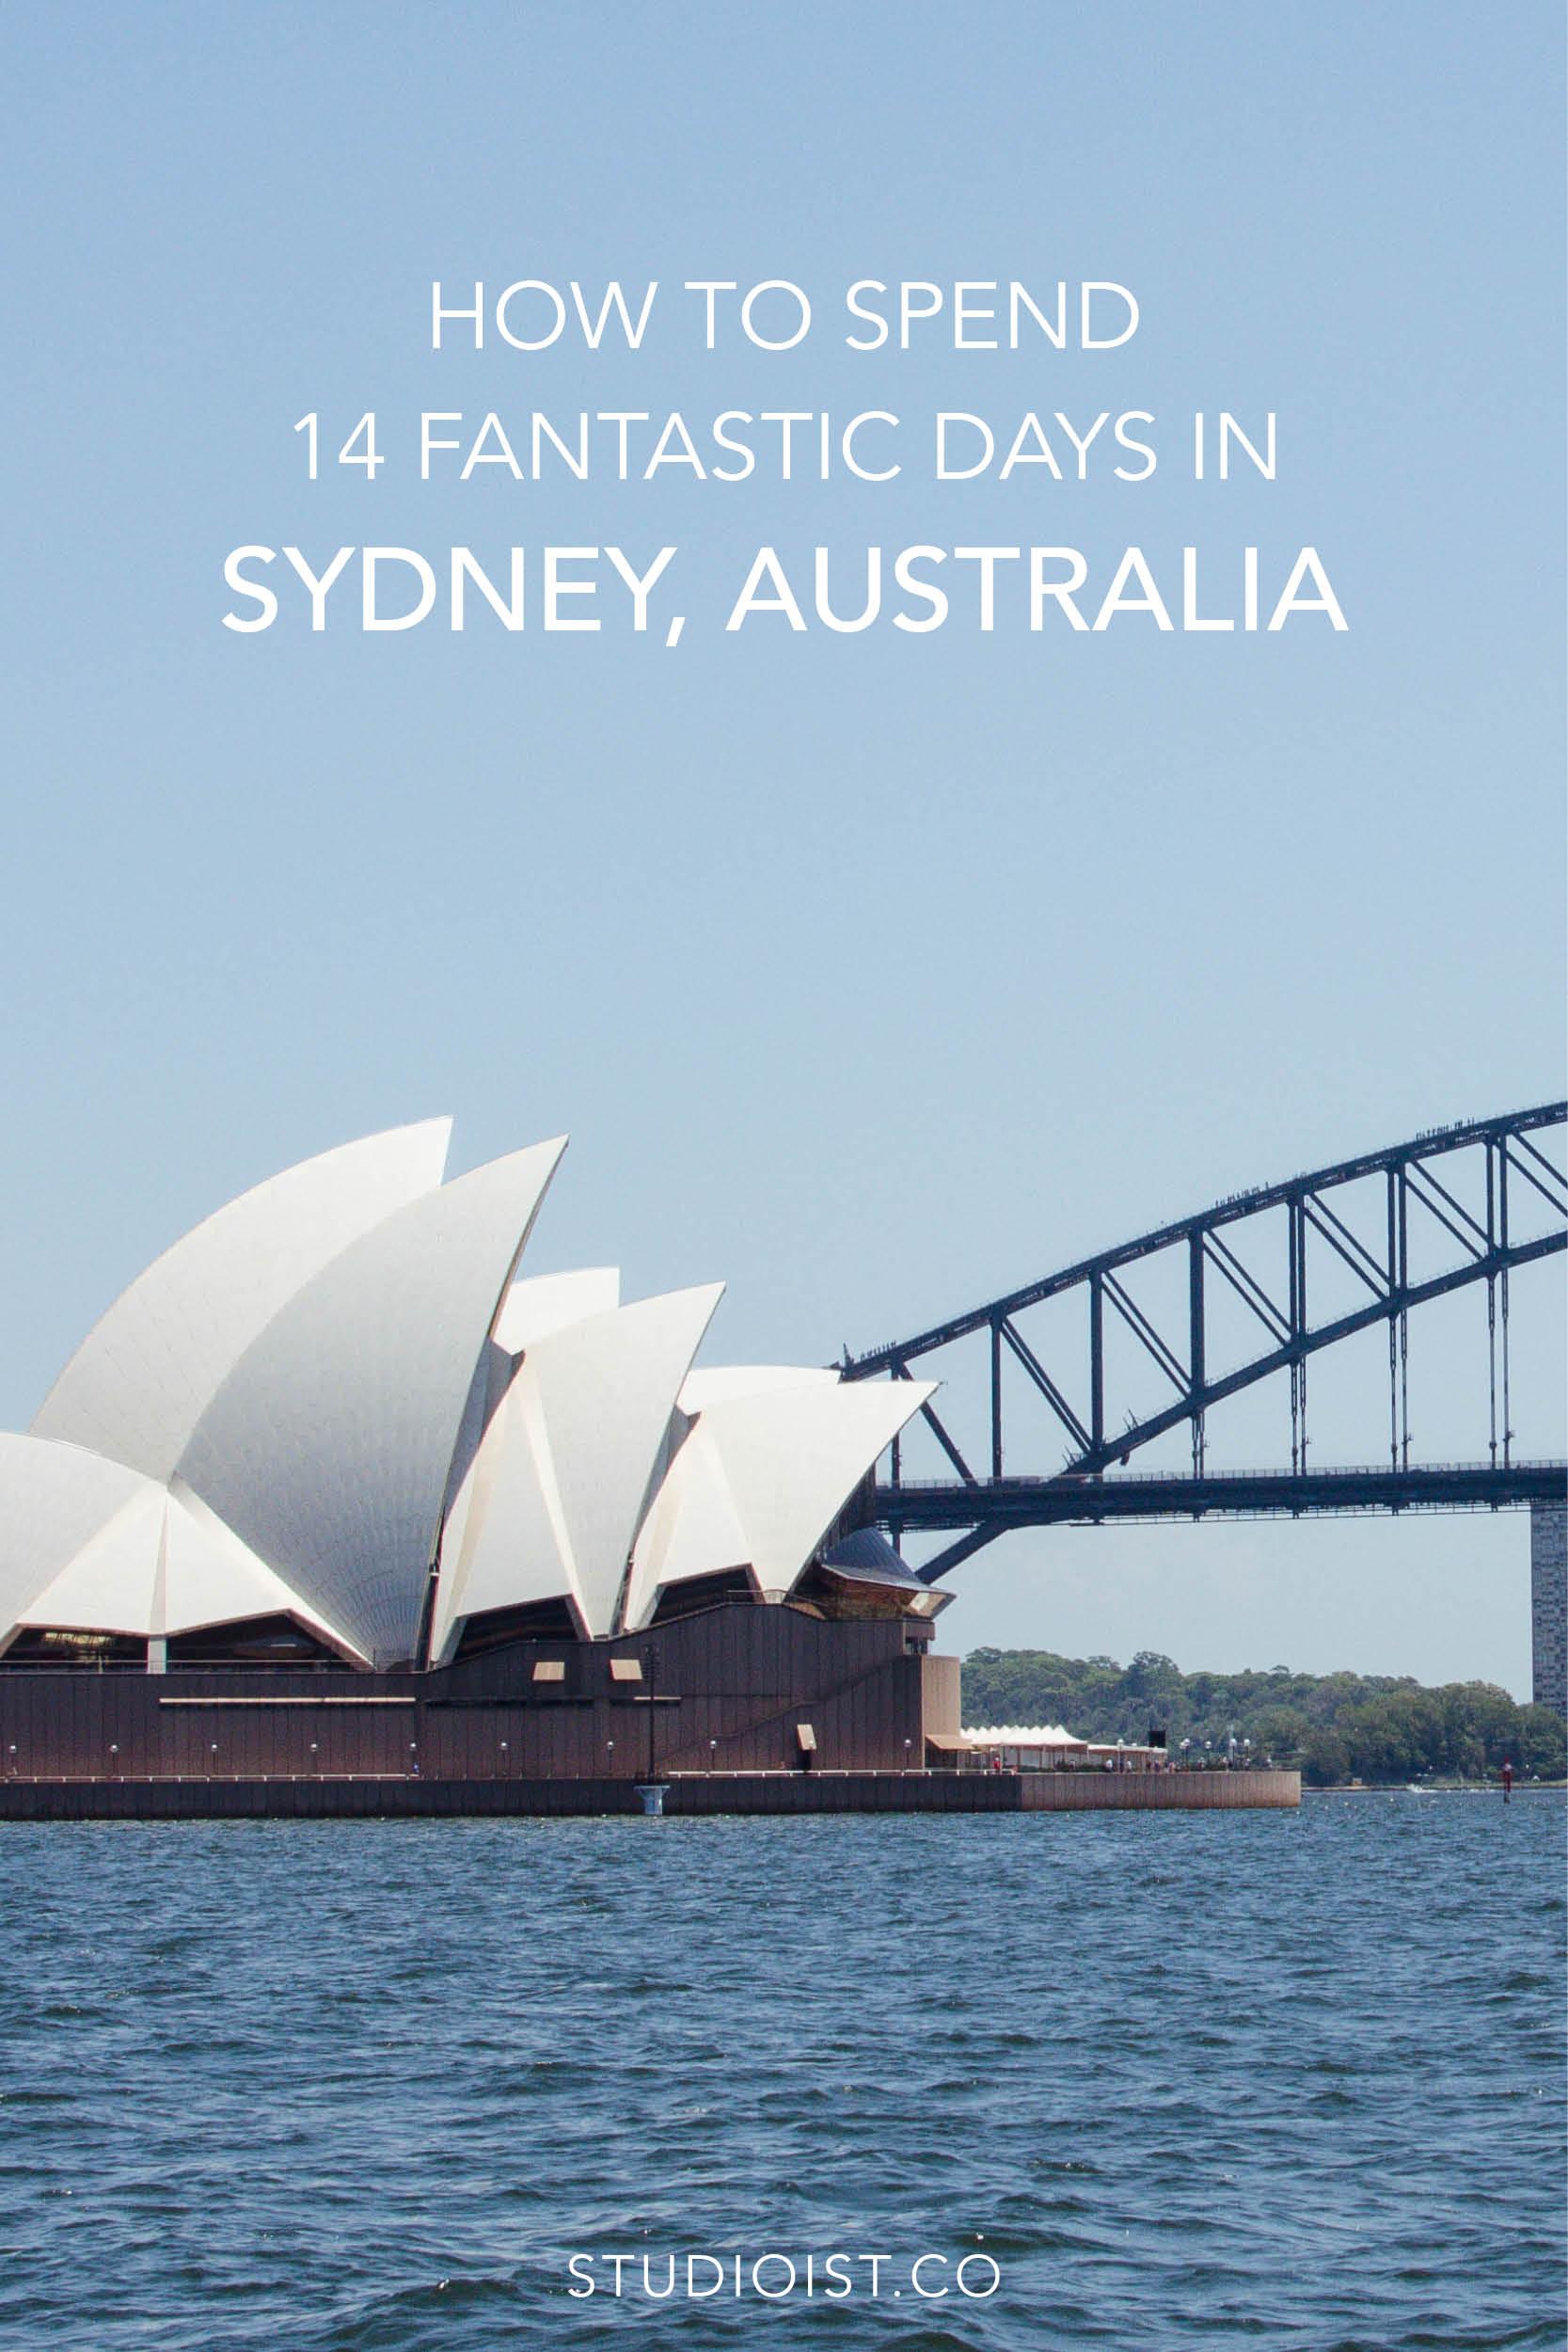 Travel Itinerary - 14 Fantastic Days In Sydney Australia